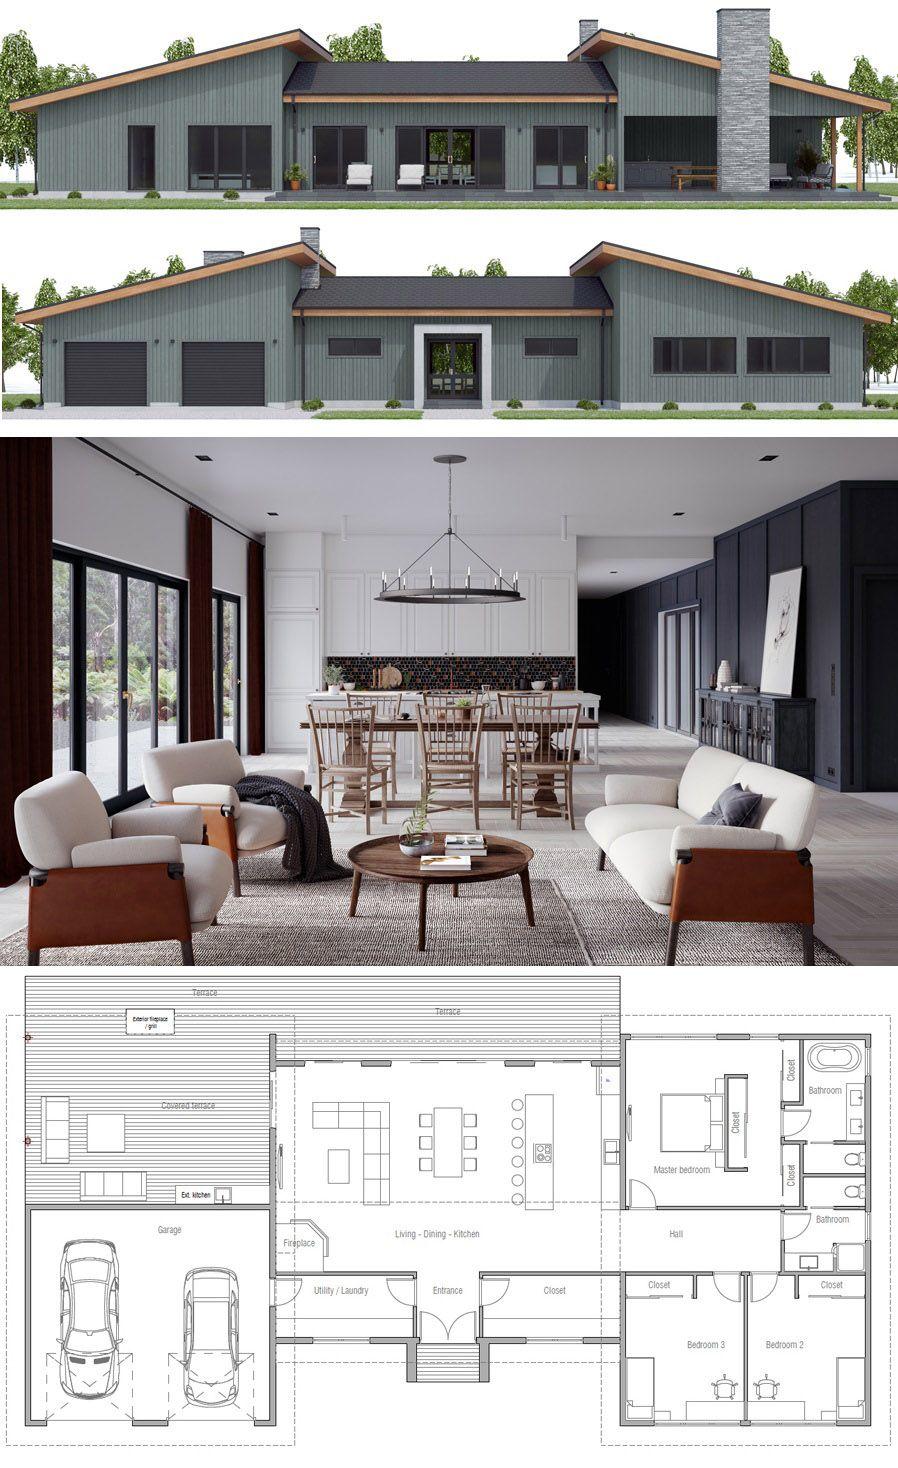 House designs new home plans floor architecture interior homeplans houseplans floorplans adhouseplans also rh pinterest